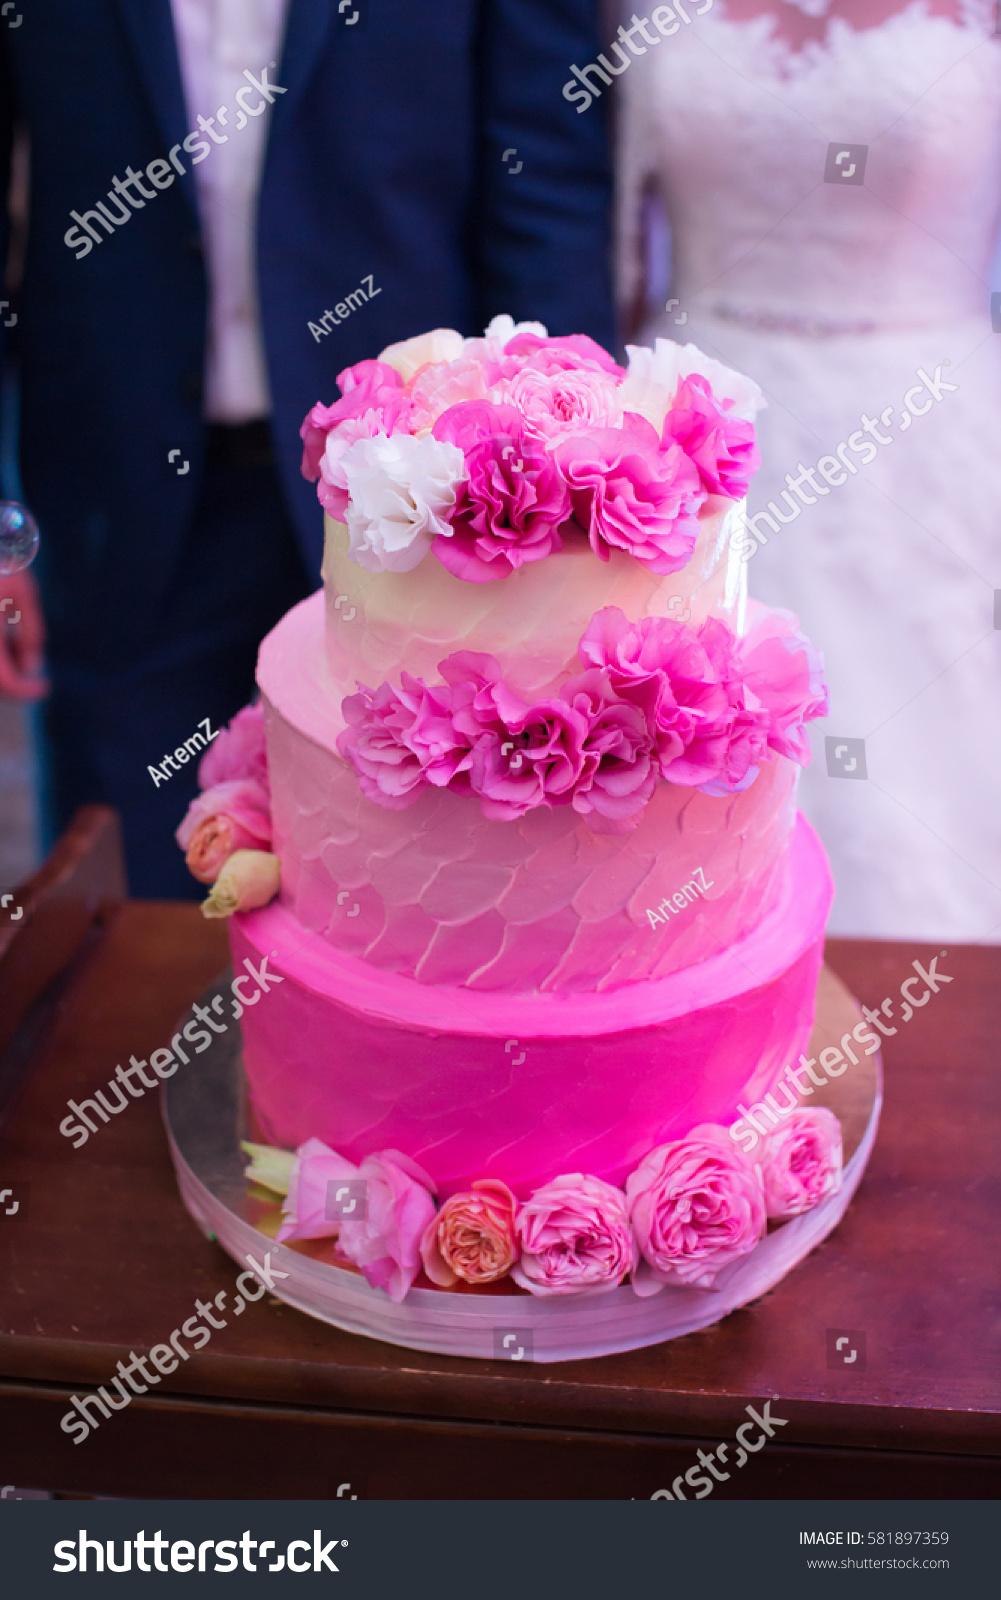 Wedding Cake Fresh Flowers Stock Photo (Edit Now) 581897359 ...